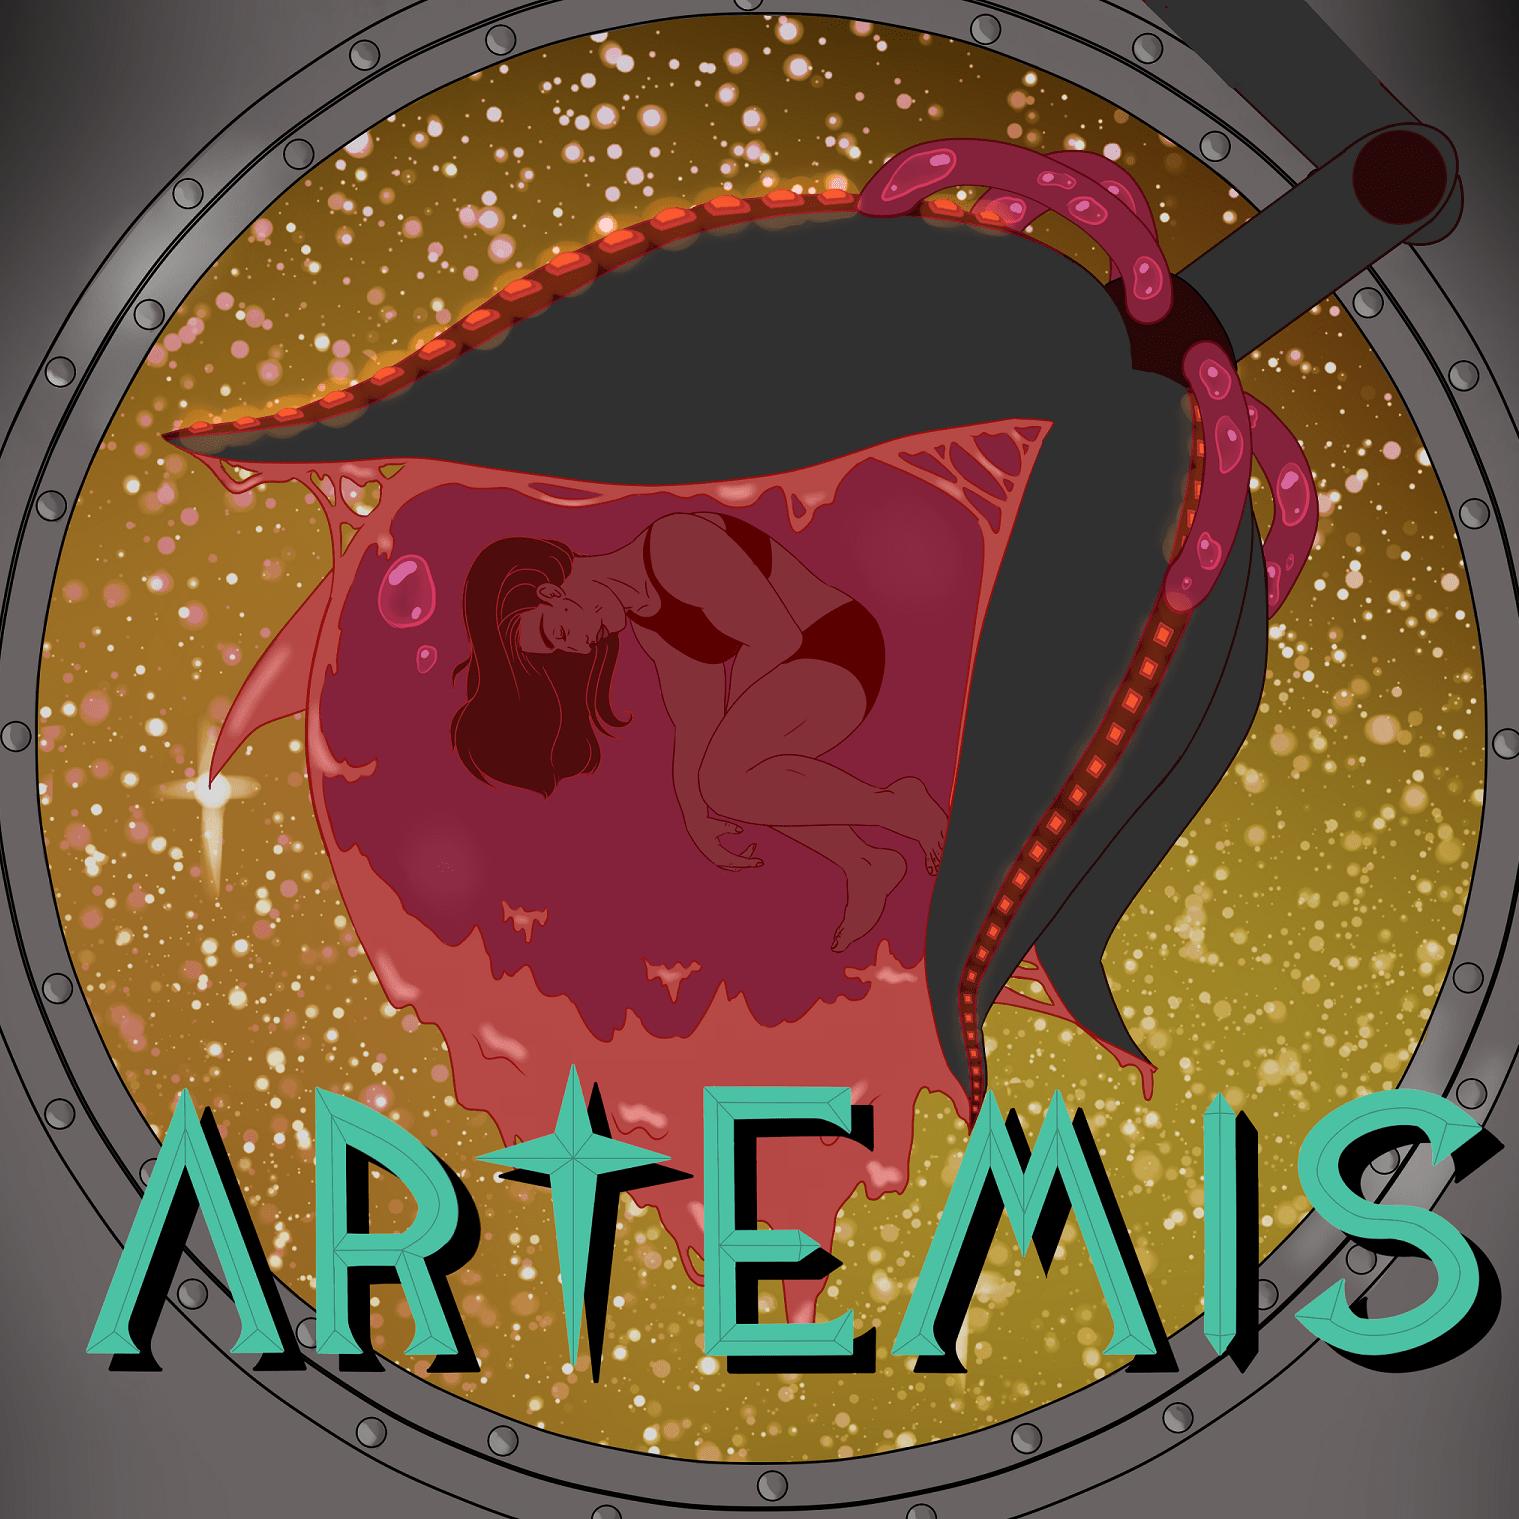 artemis-e1537544016775.png